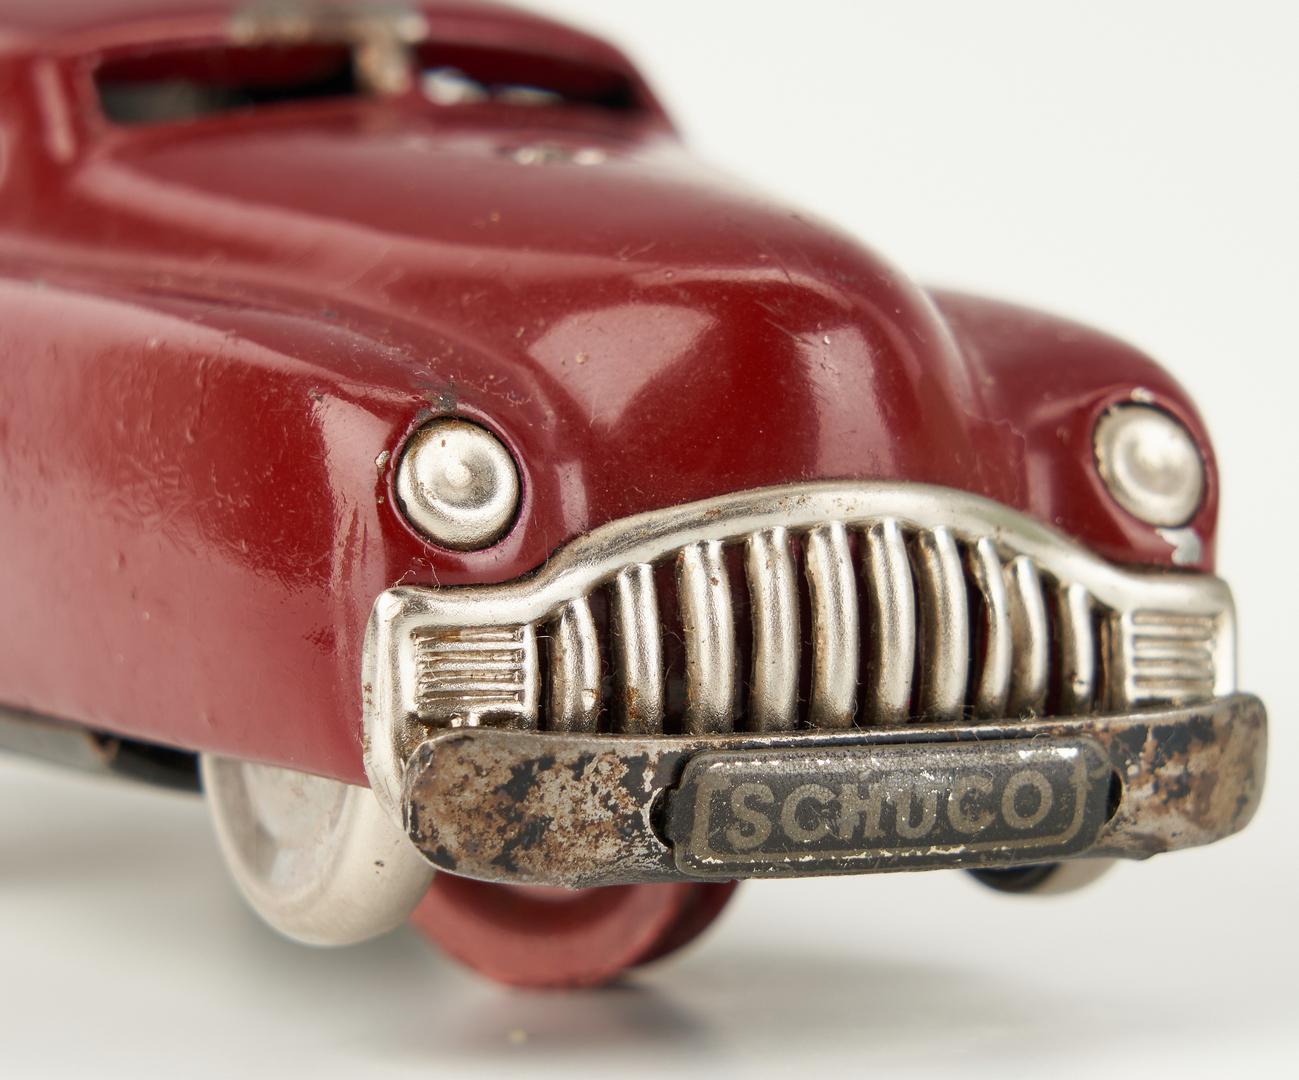 Lot 799: 5 Tin & Metal Toy Cars incl. Marx, Schuco, Wyandotte